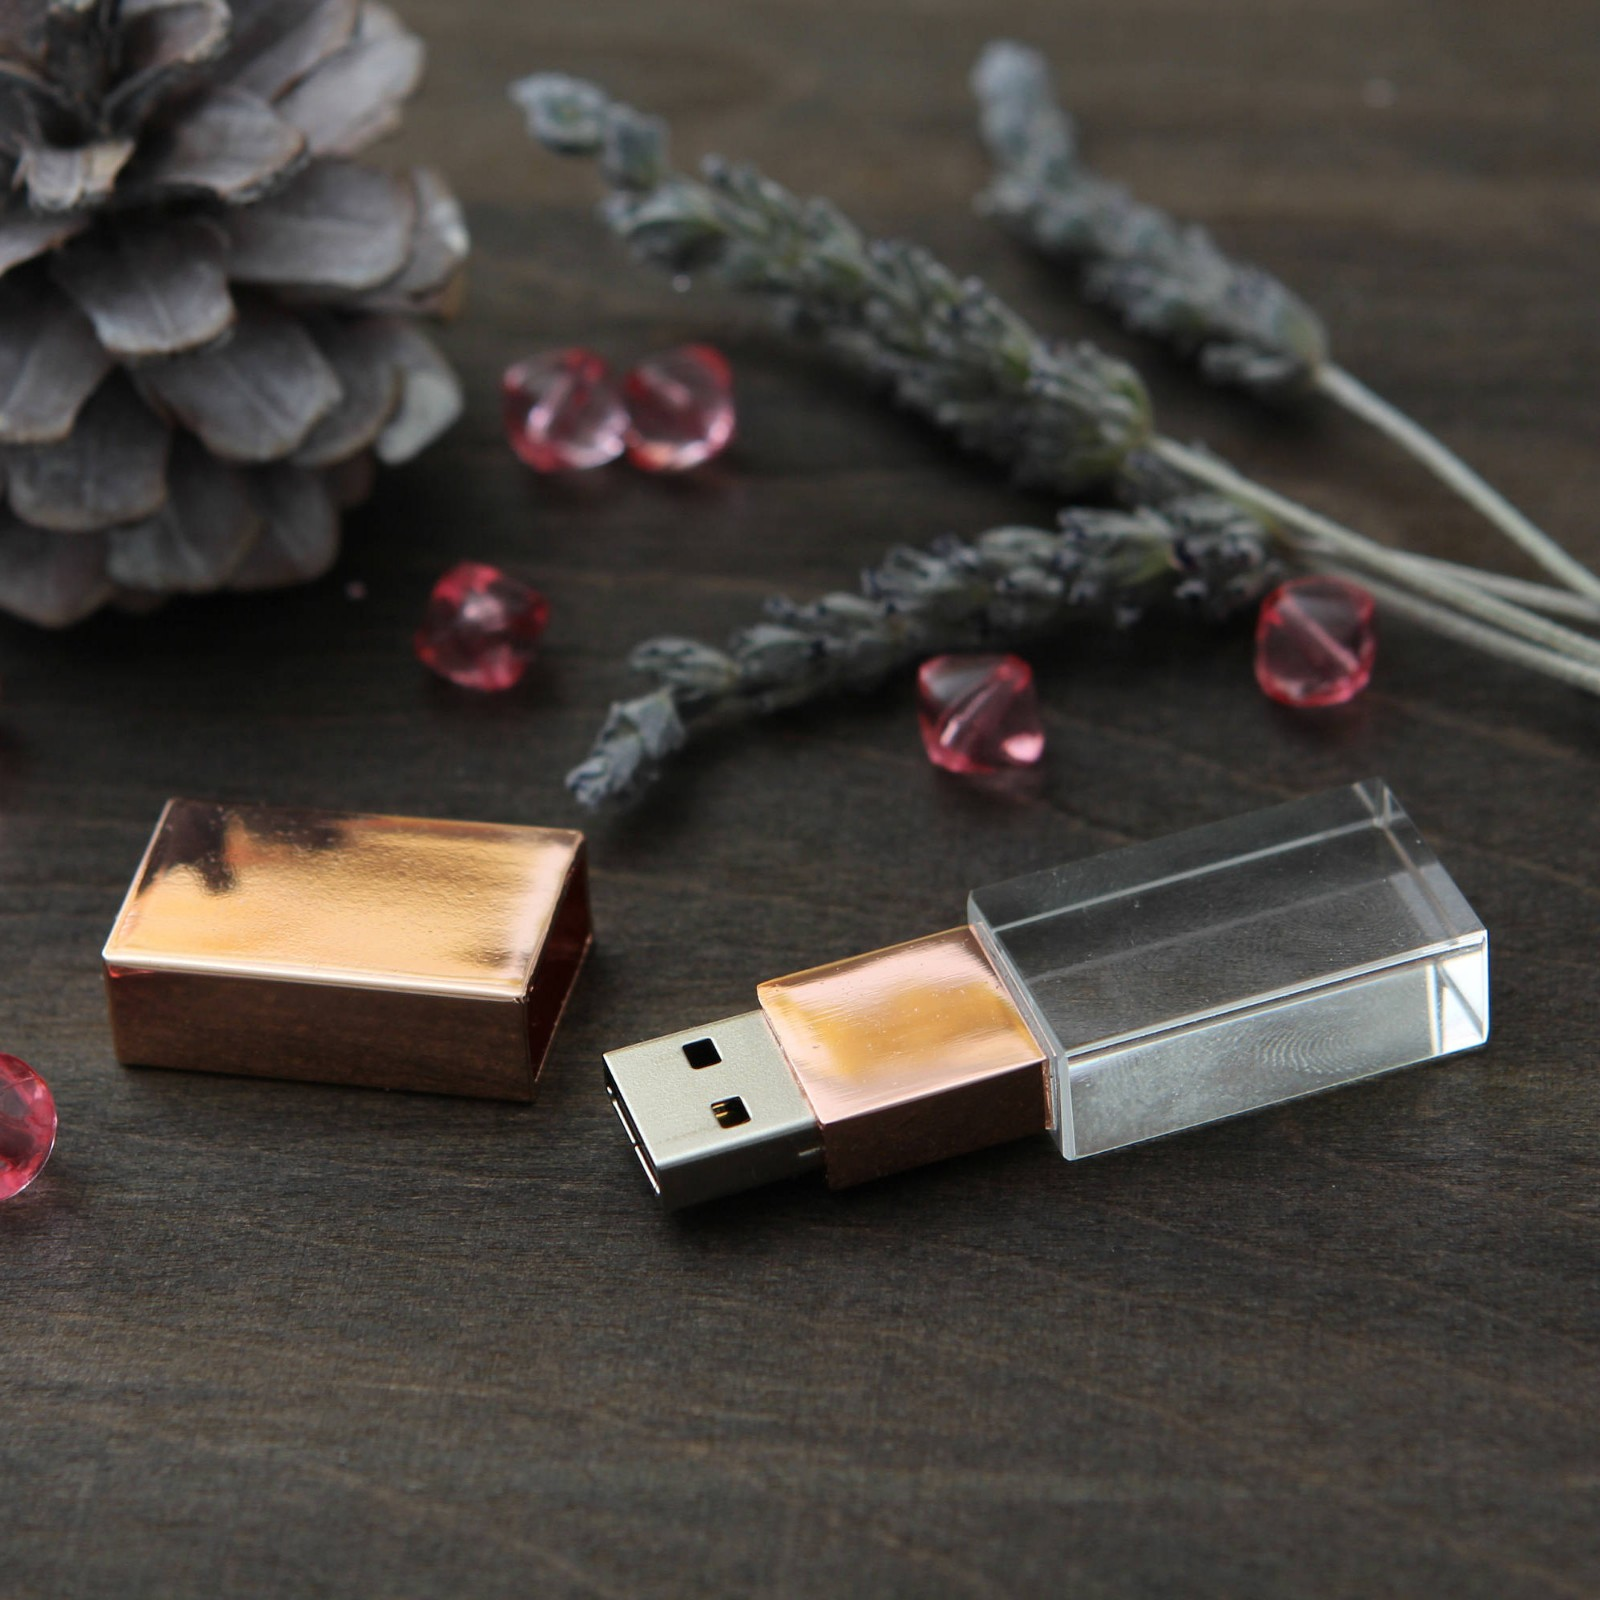 Glass Crystal USB 3.0 Flash Drive Customized Family Wedding Gift Pendrive 16GB